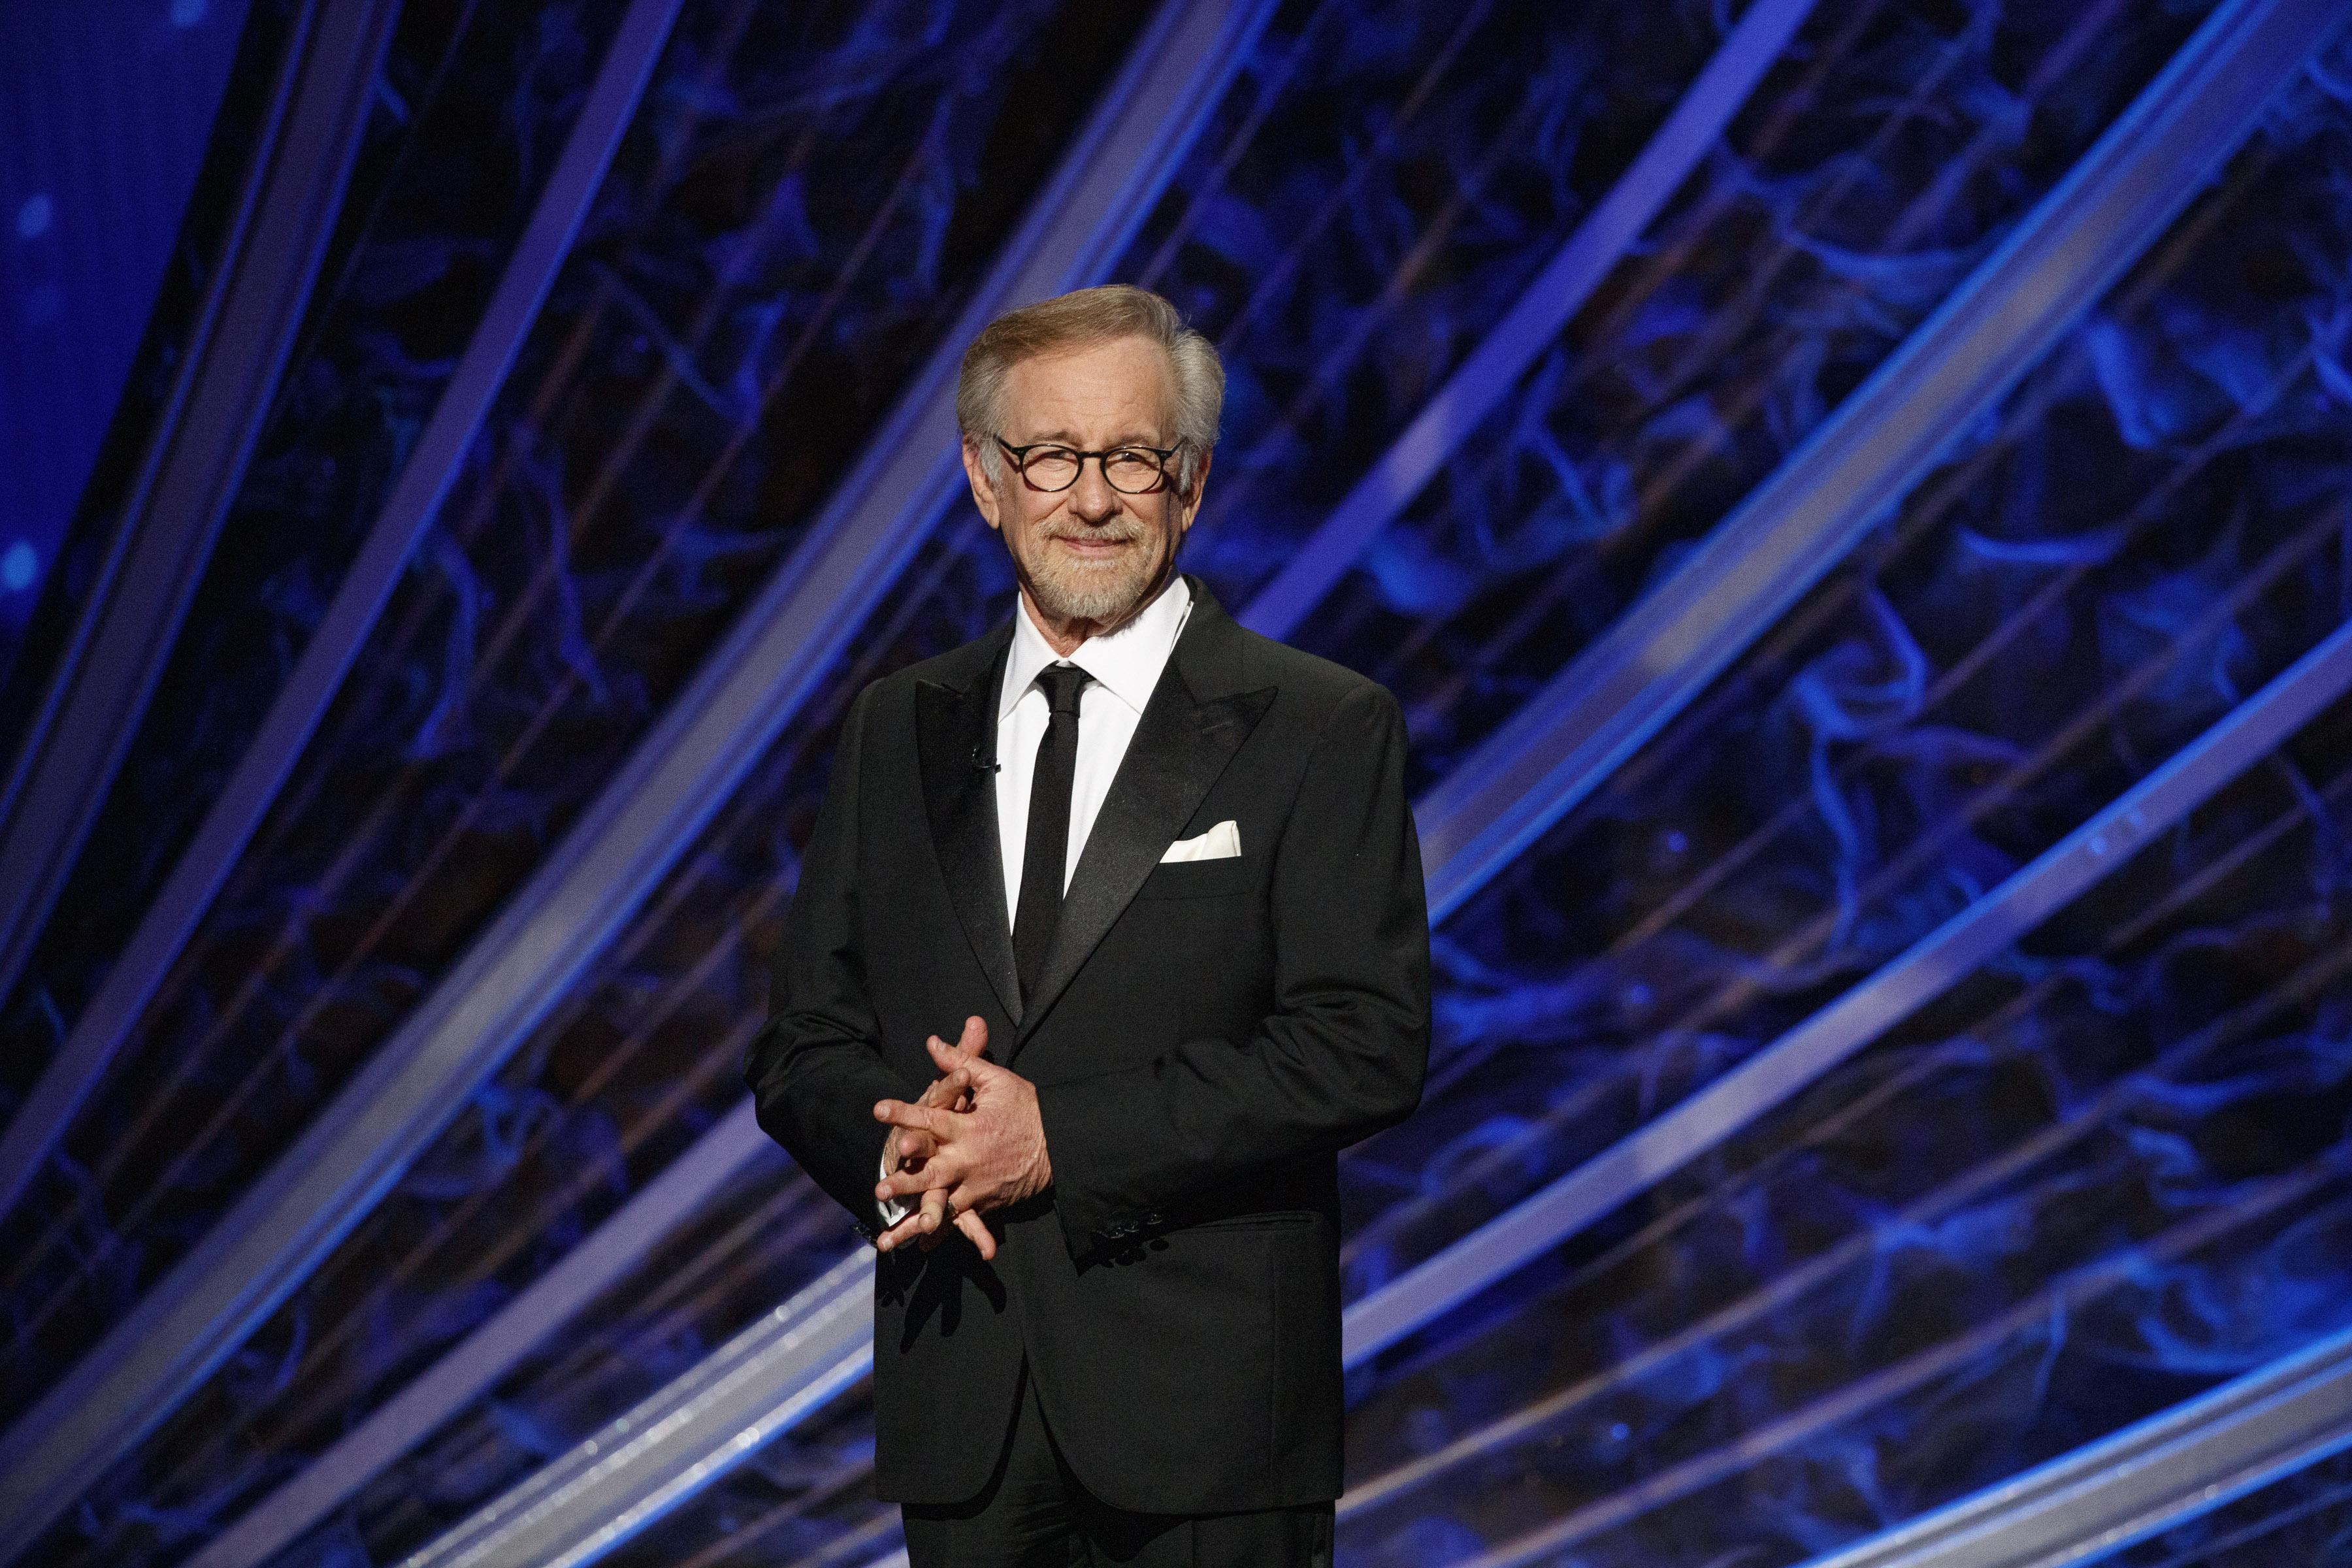 Steven Spielberg will produce movies for Netflix, Digital Rumble, digitalrumble.com